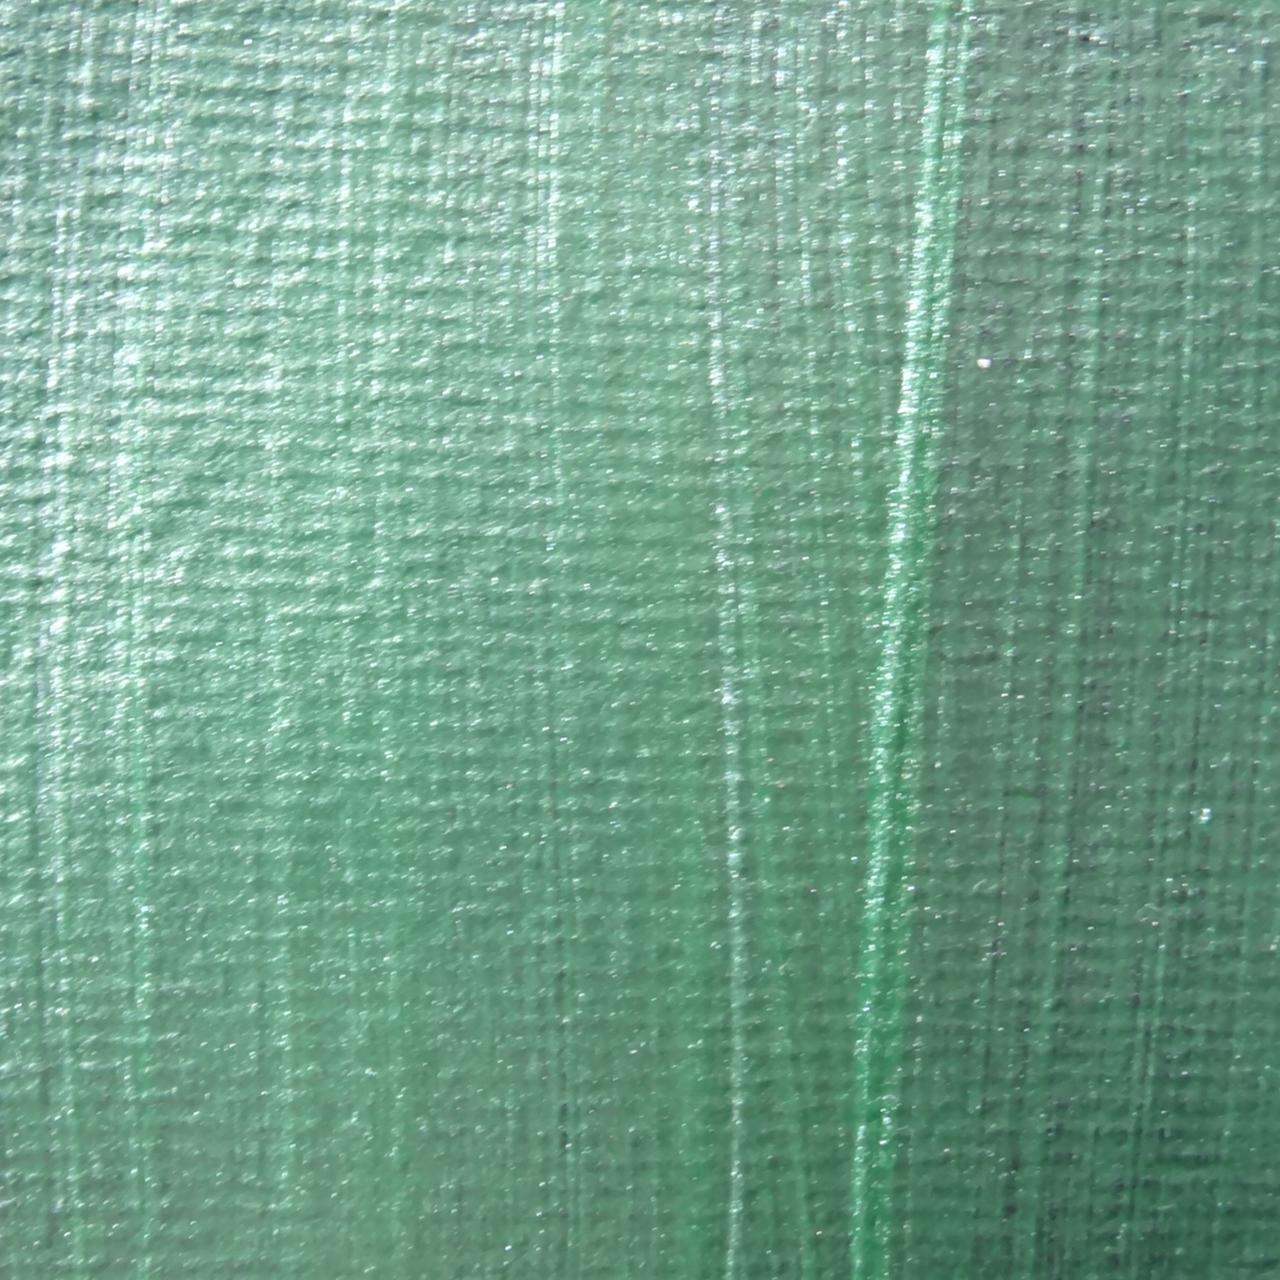 Декоративная краска, Pearl and Metallic, вечений изумруд, 50 мл, ScrapEgo